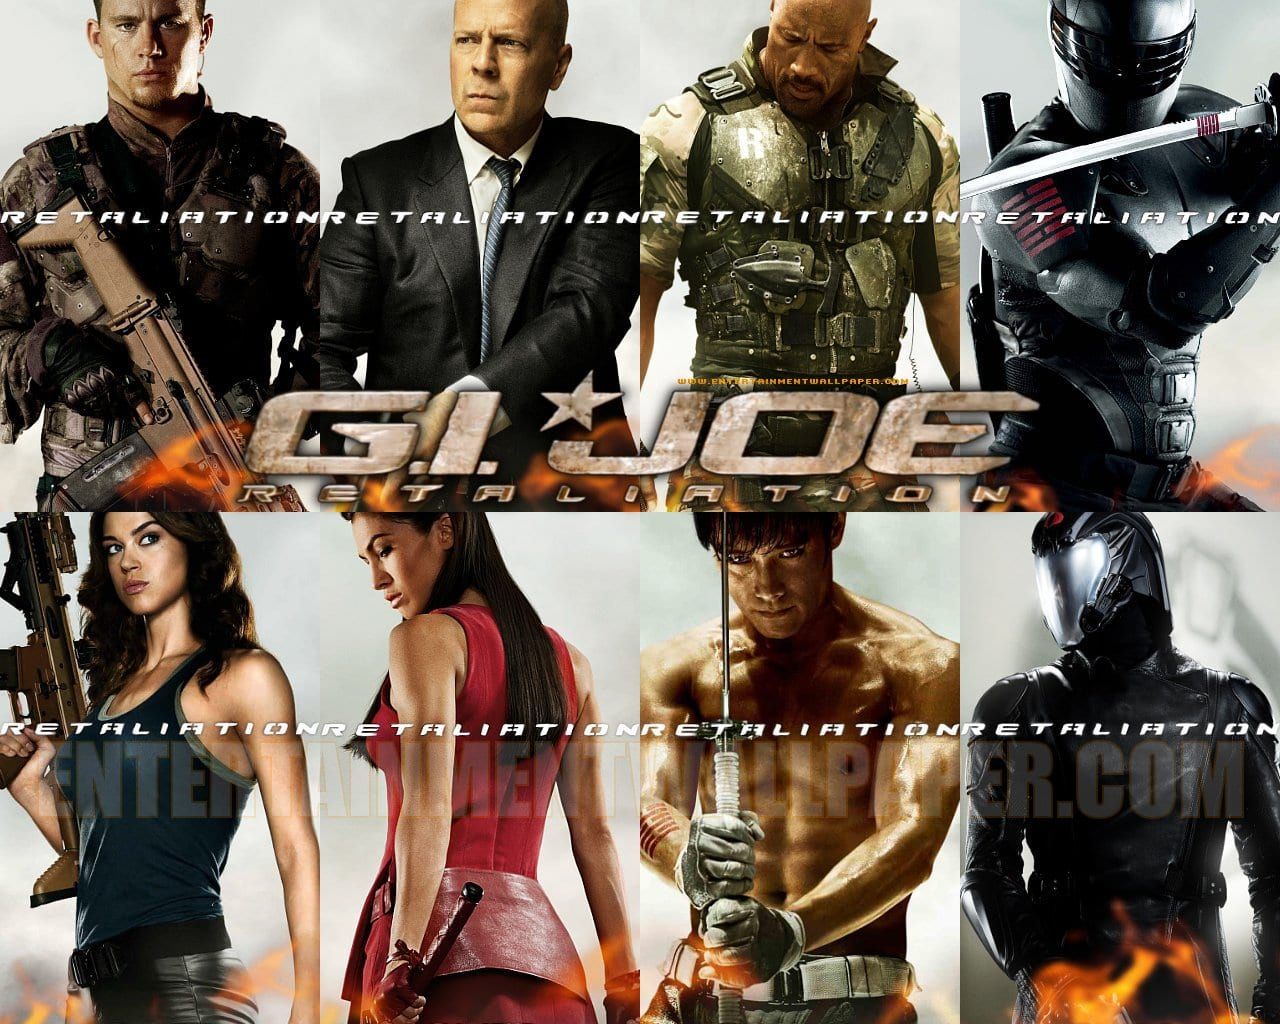 New International Poster for G.I. Joe: Retaliation Featuring Bruce Willis